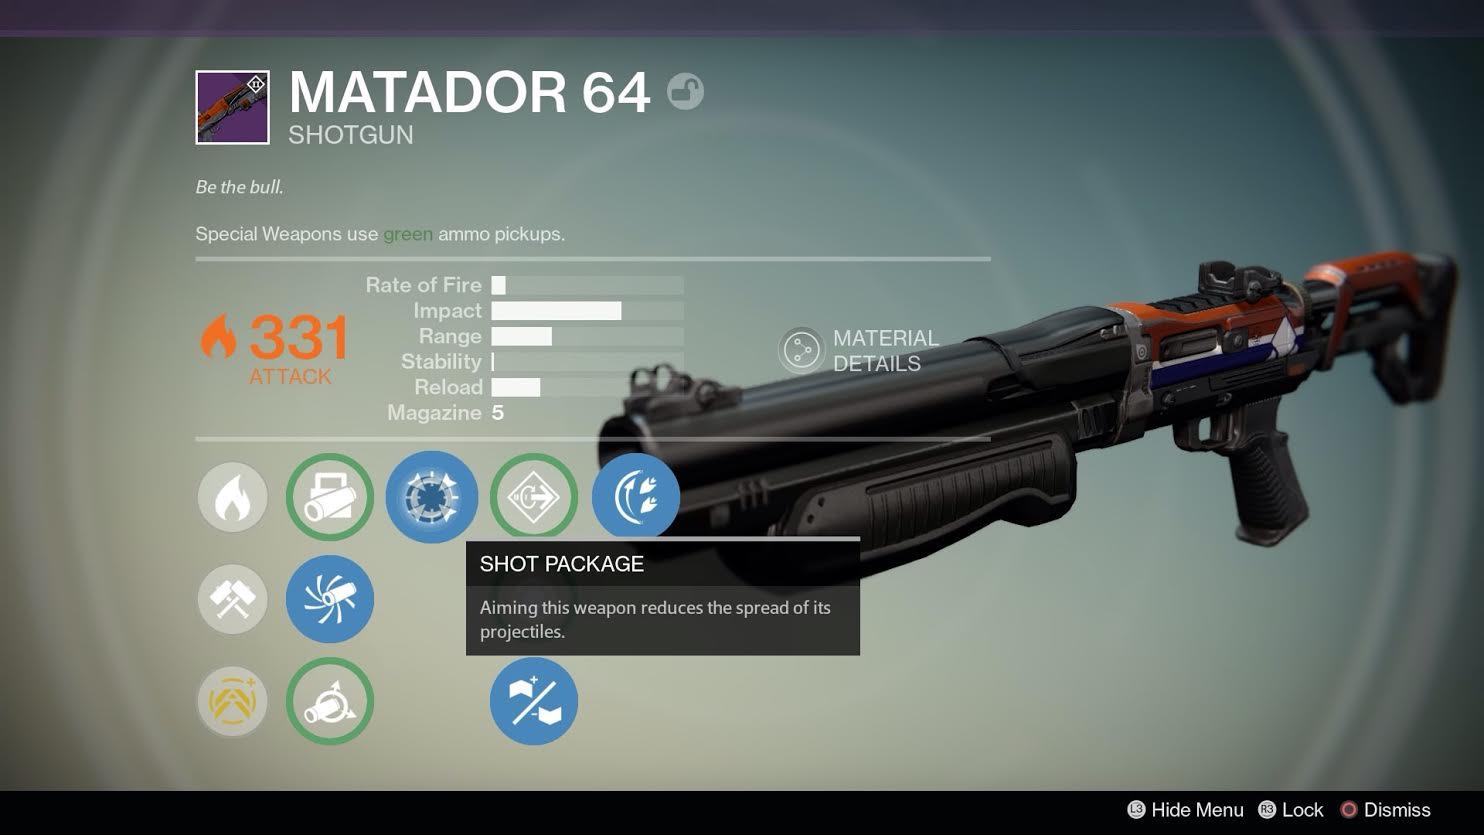 Image for Destiny: Is Matador 64 the ultimate shotgun?